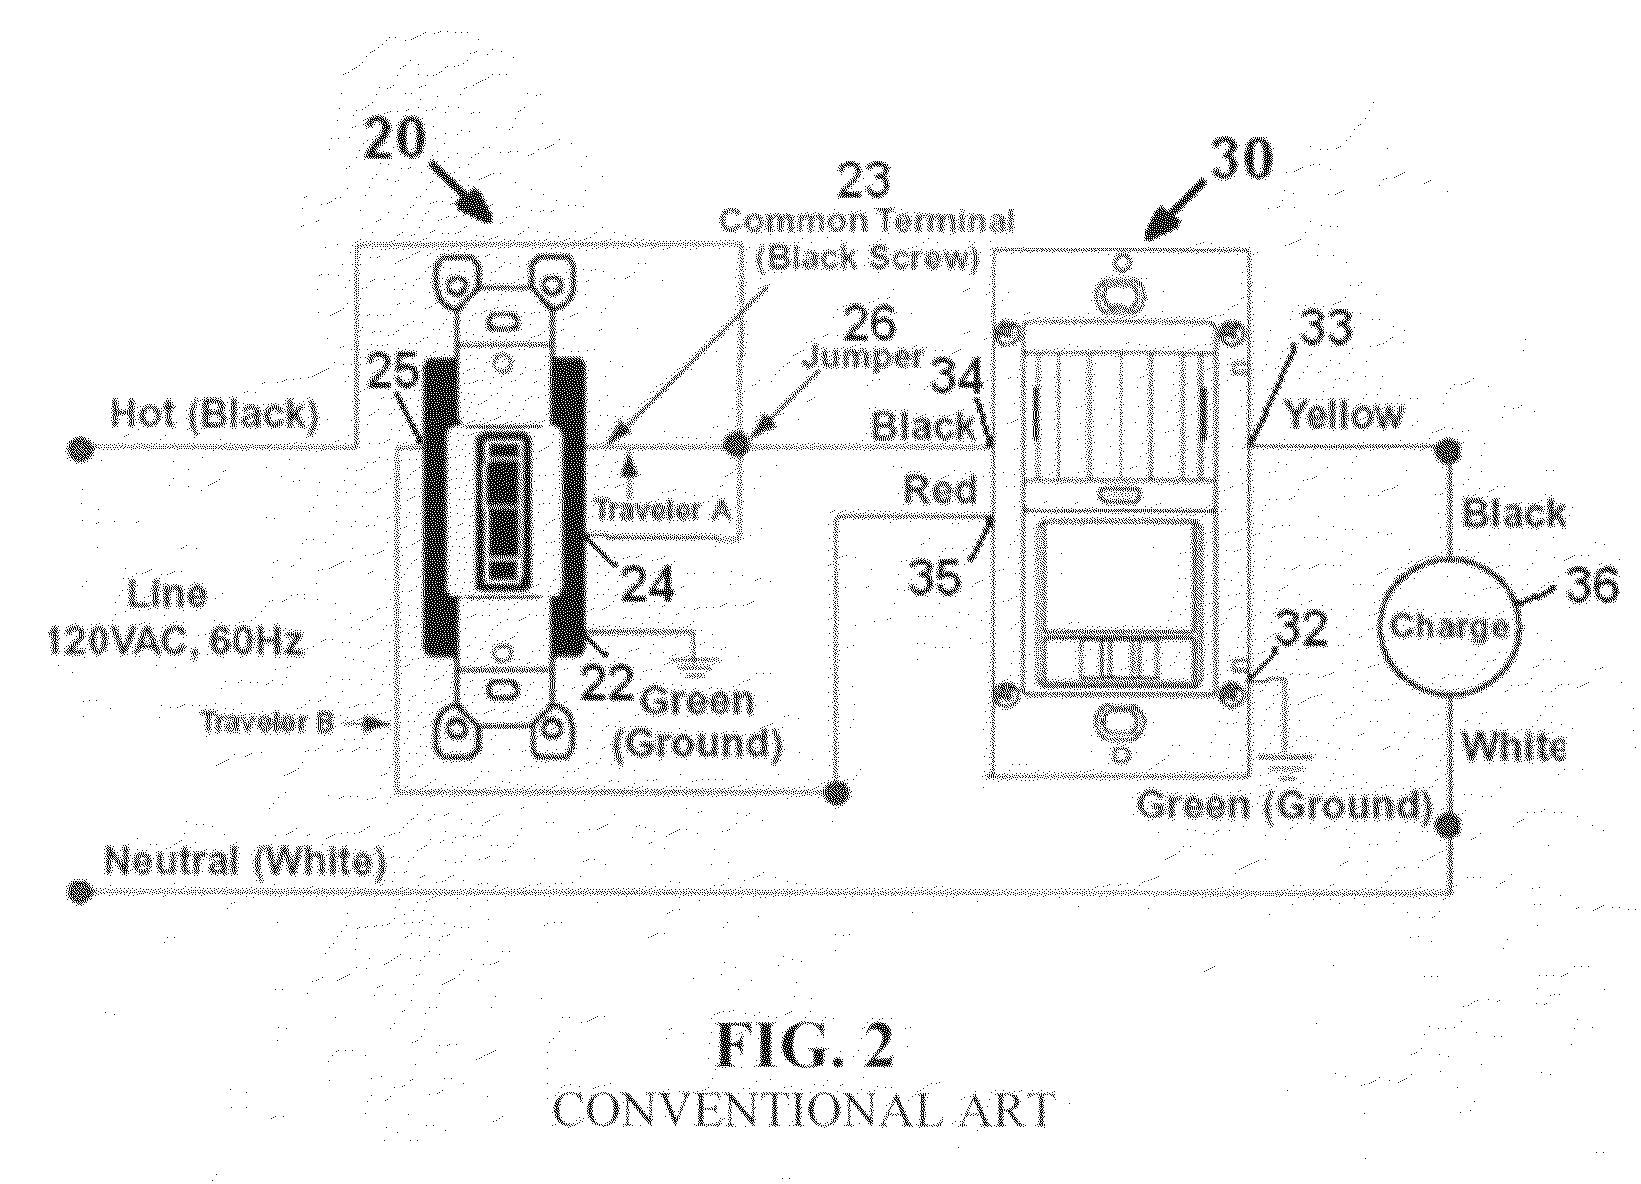 Leviton Electrical Schematic Wiring Diagram - Auto Electrical Wiring DiagramWiring Diagram